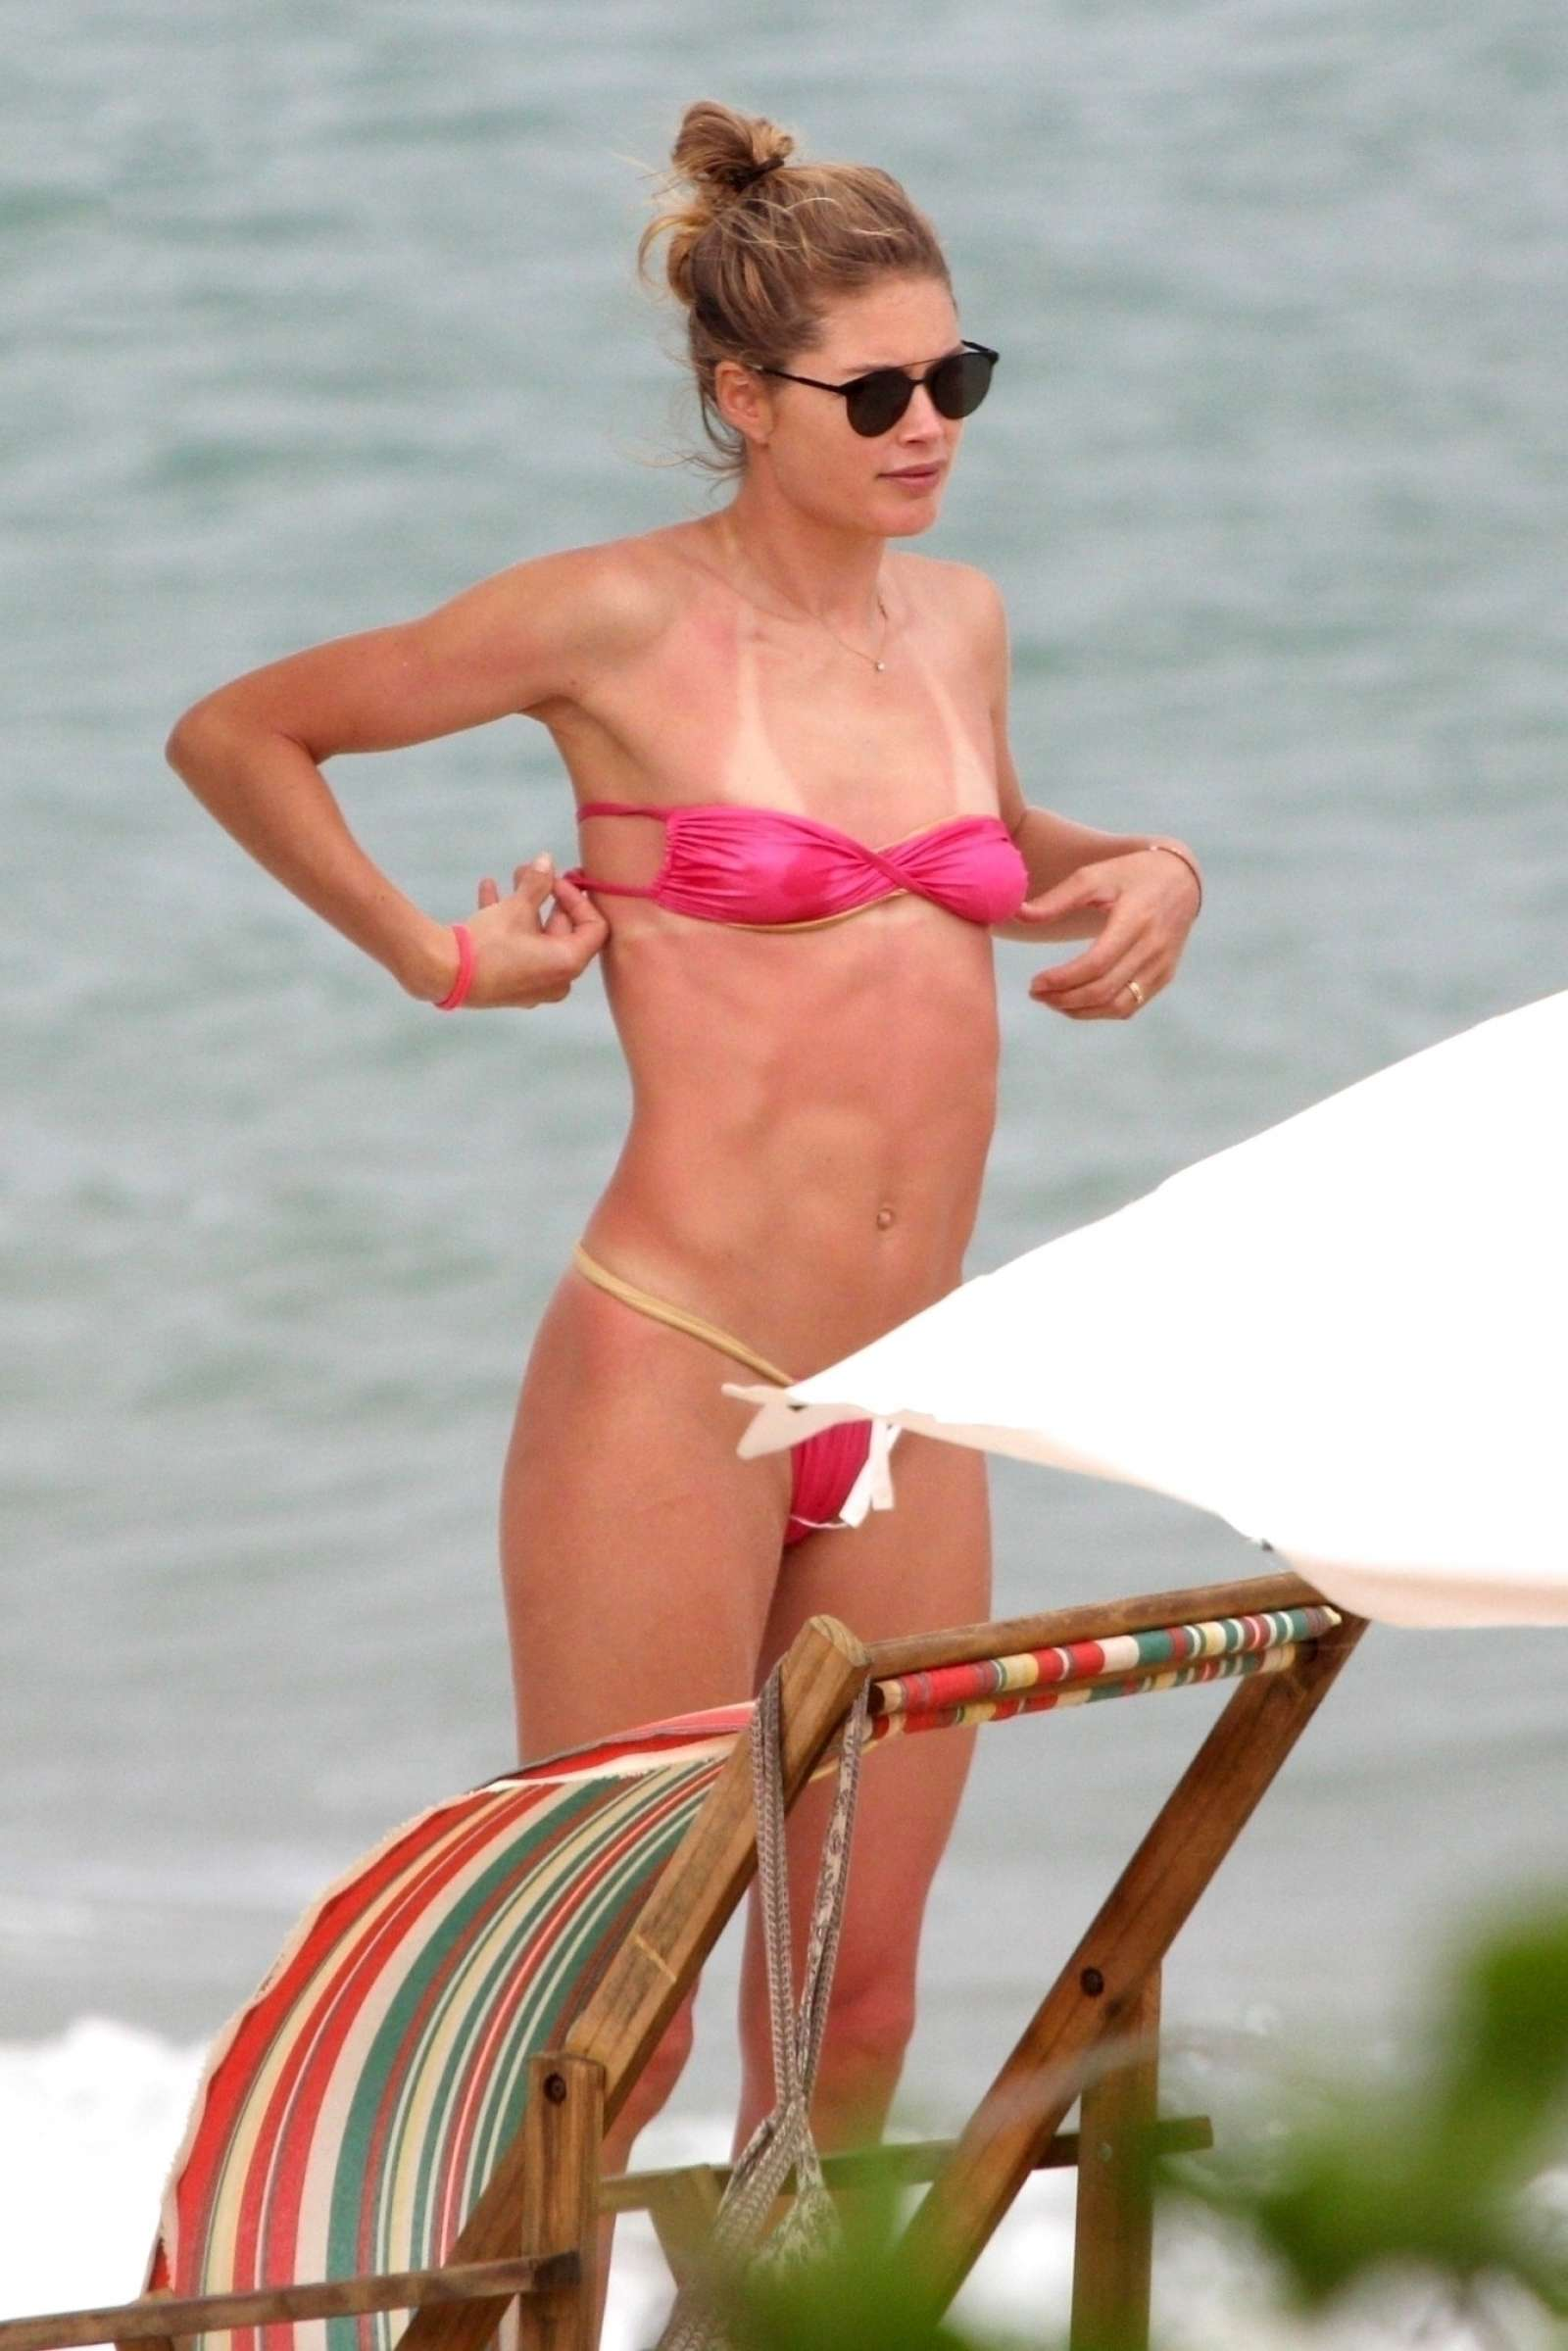 Doutzen Kroes in Bikini on the beach in Bahia